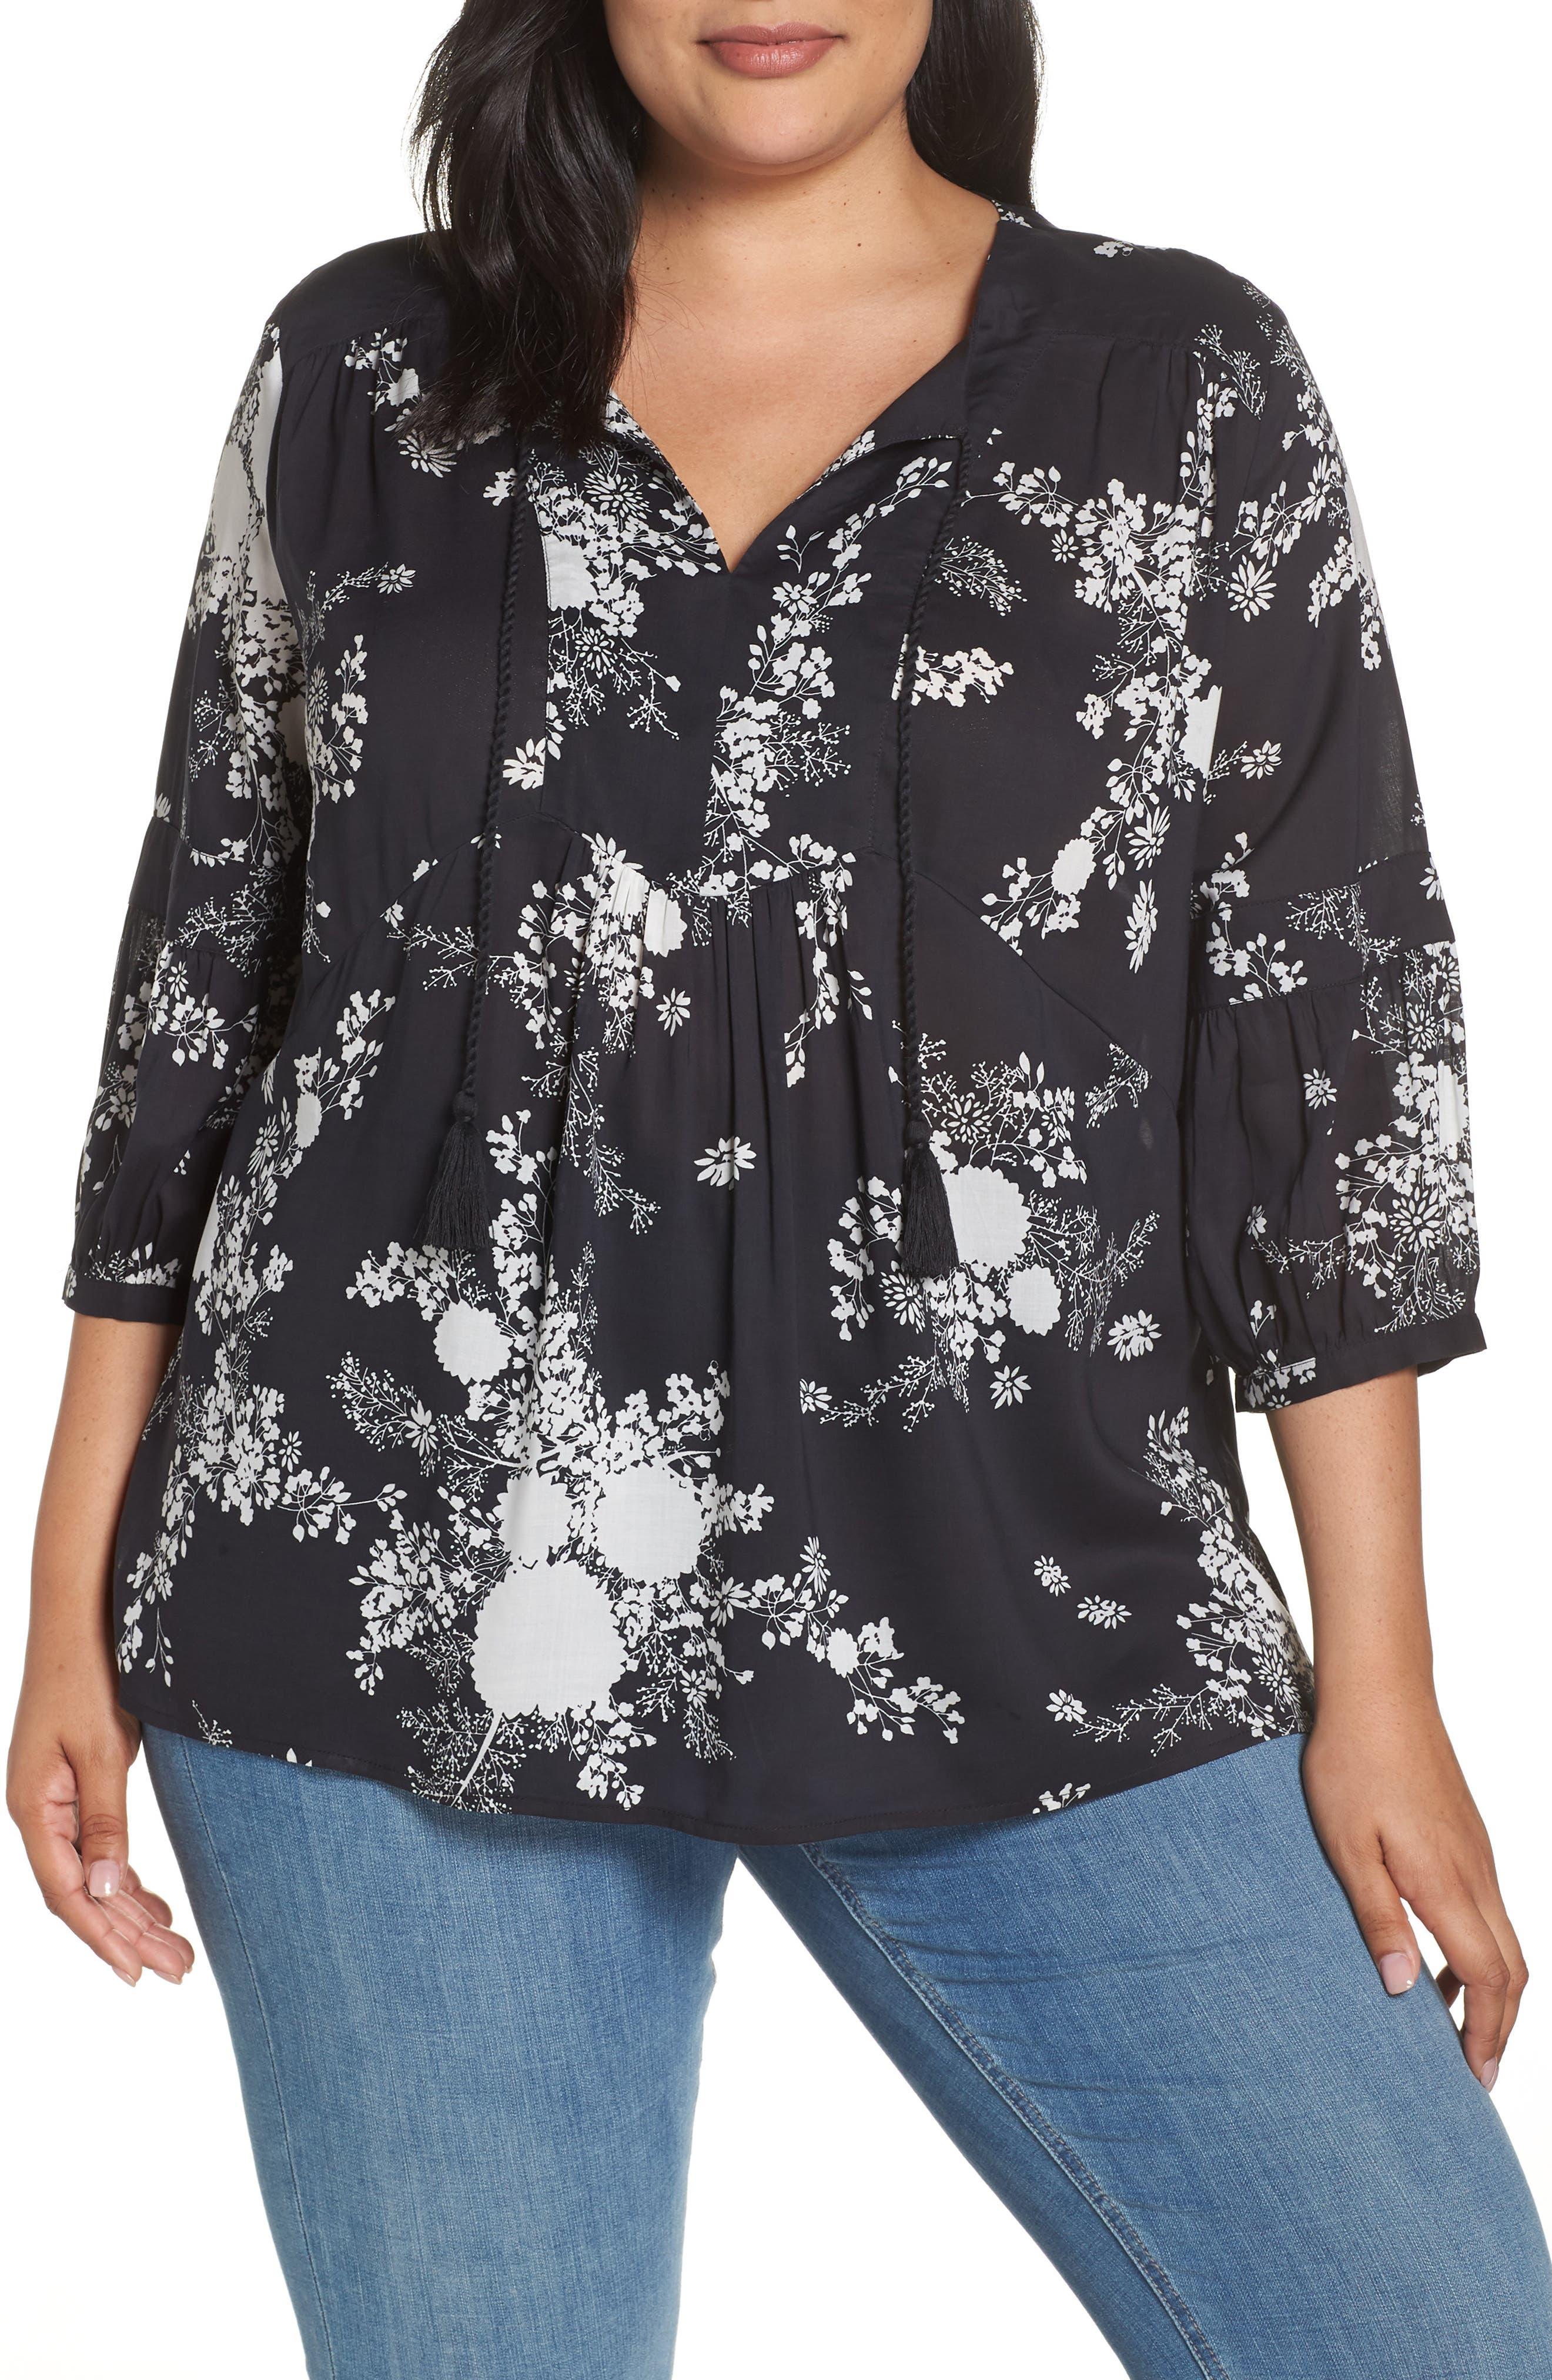 Floral Print Blouse,                         Main,                         color, BLACK BLOOM FLORAL